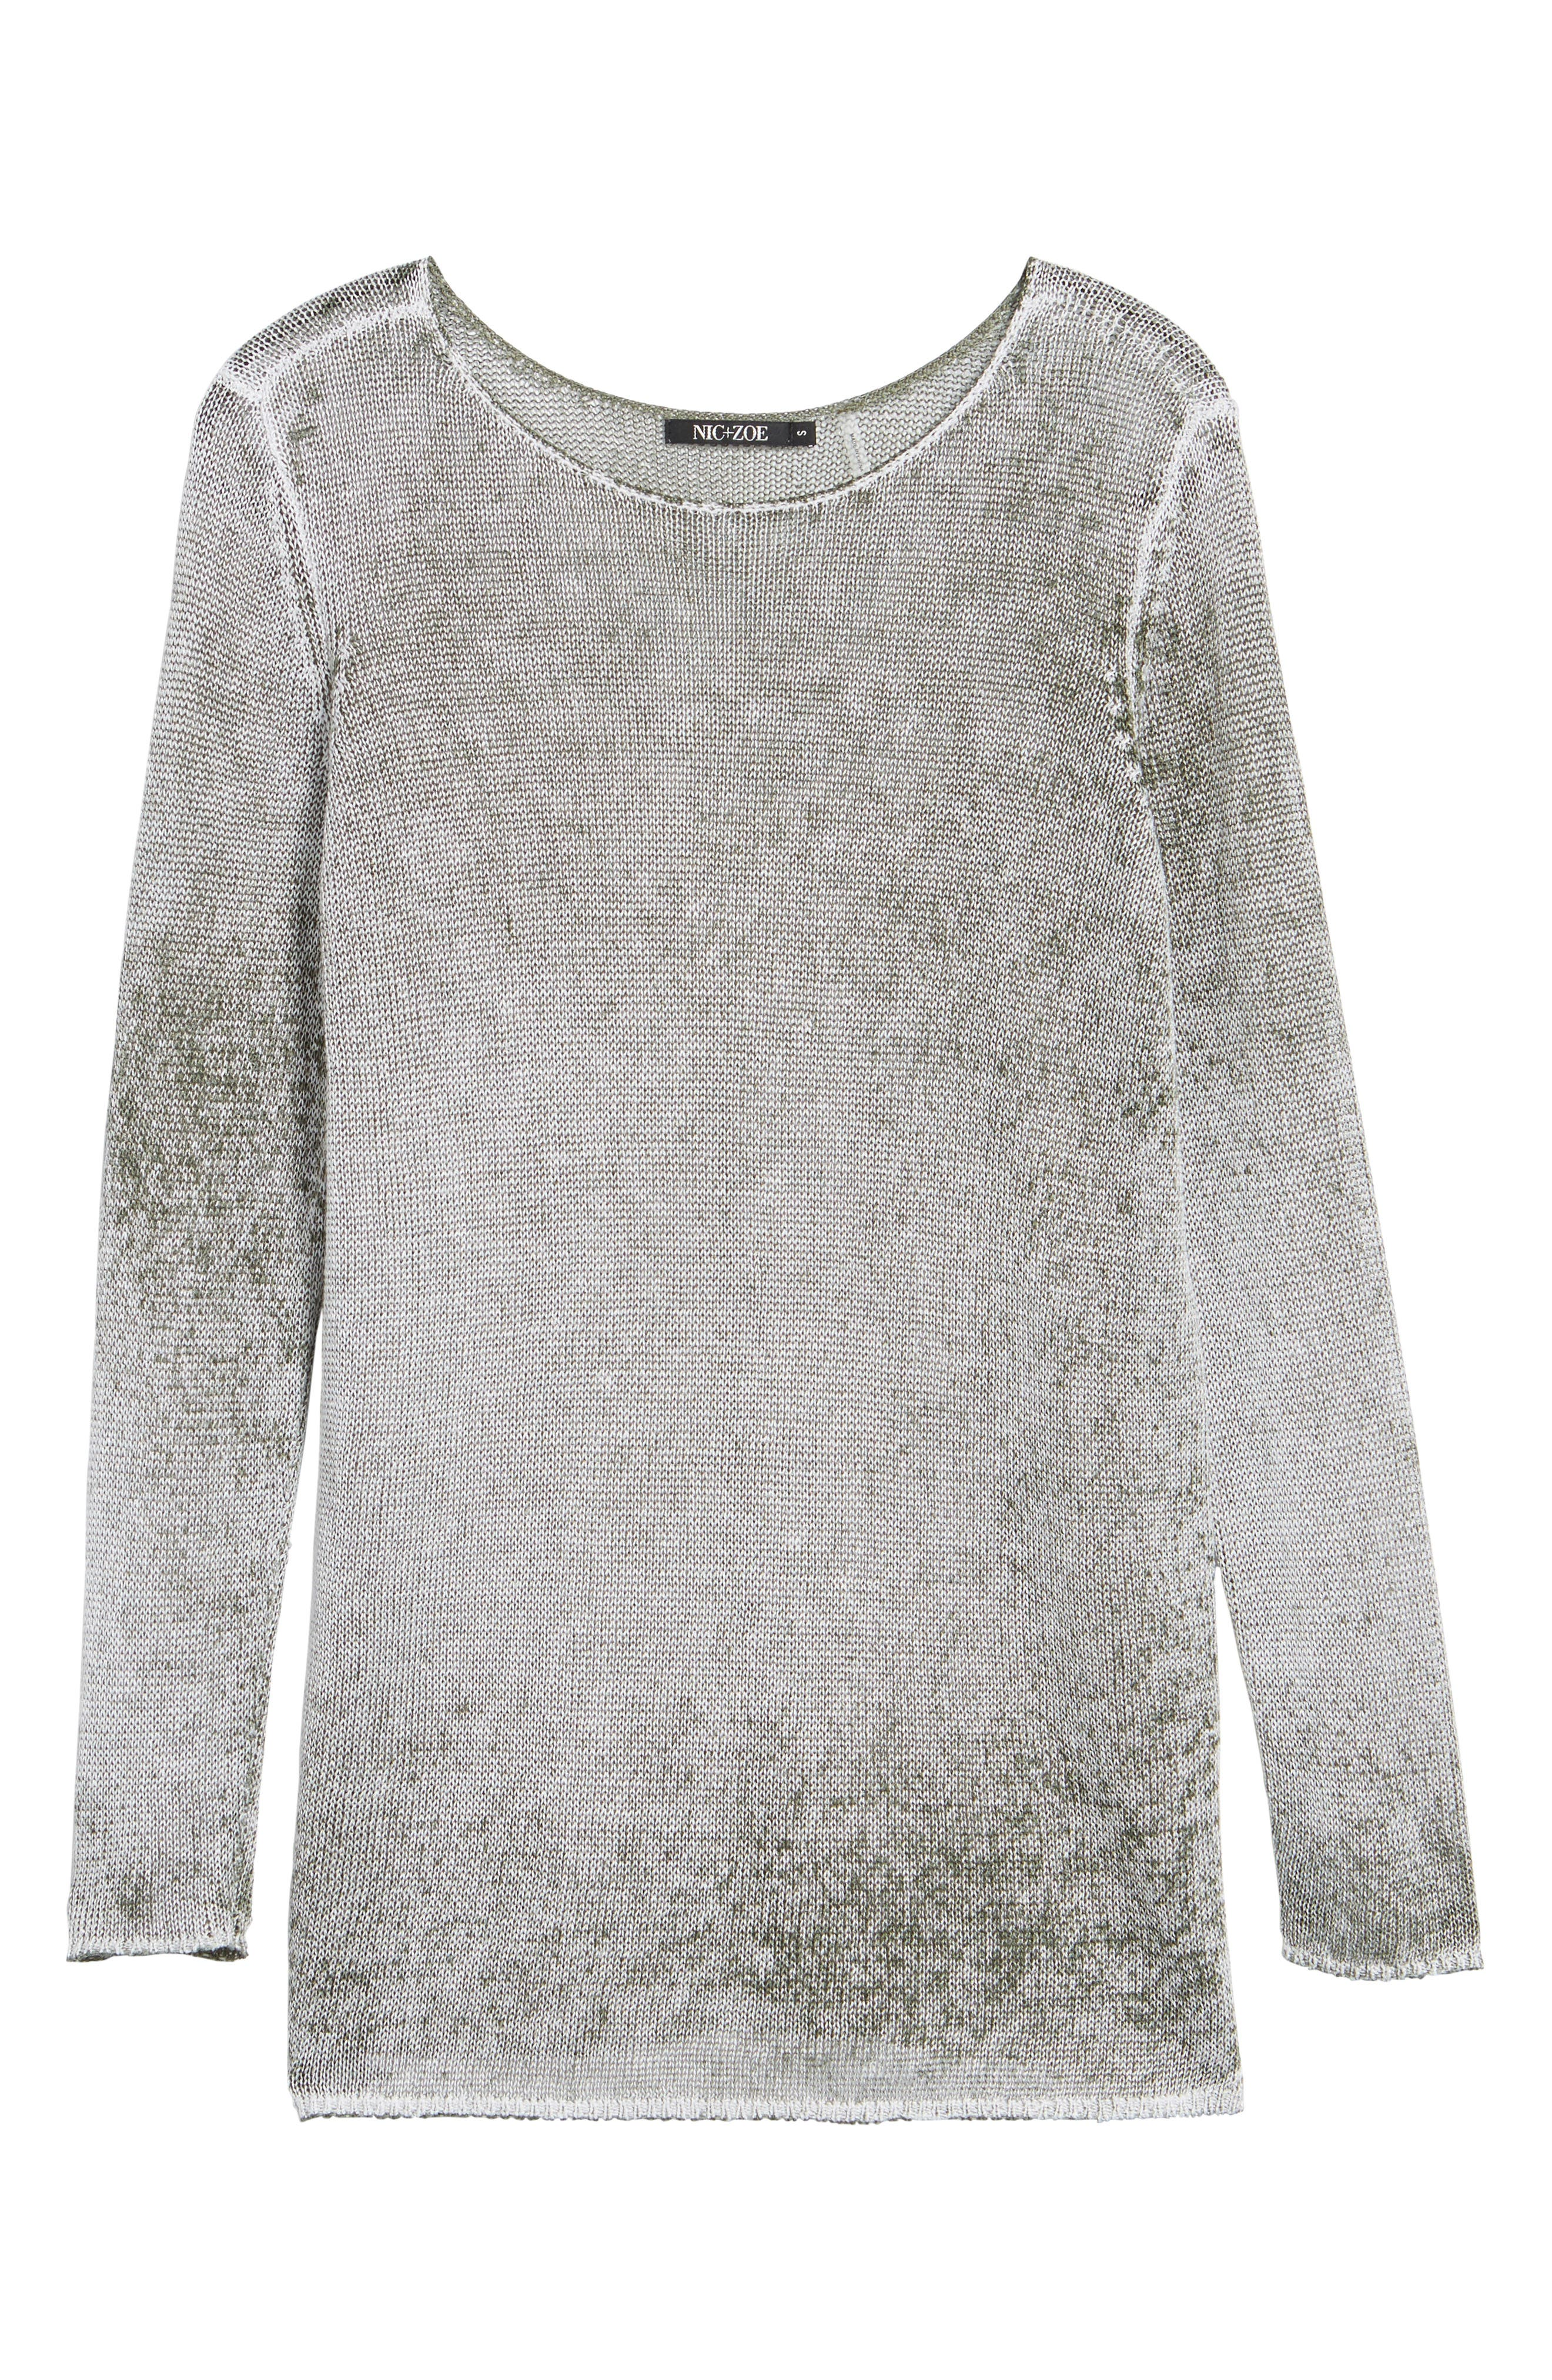 NIC + ZOE Poolside Linen Blend Sweater,                             Alternate thumbnail 22, color,